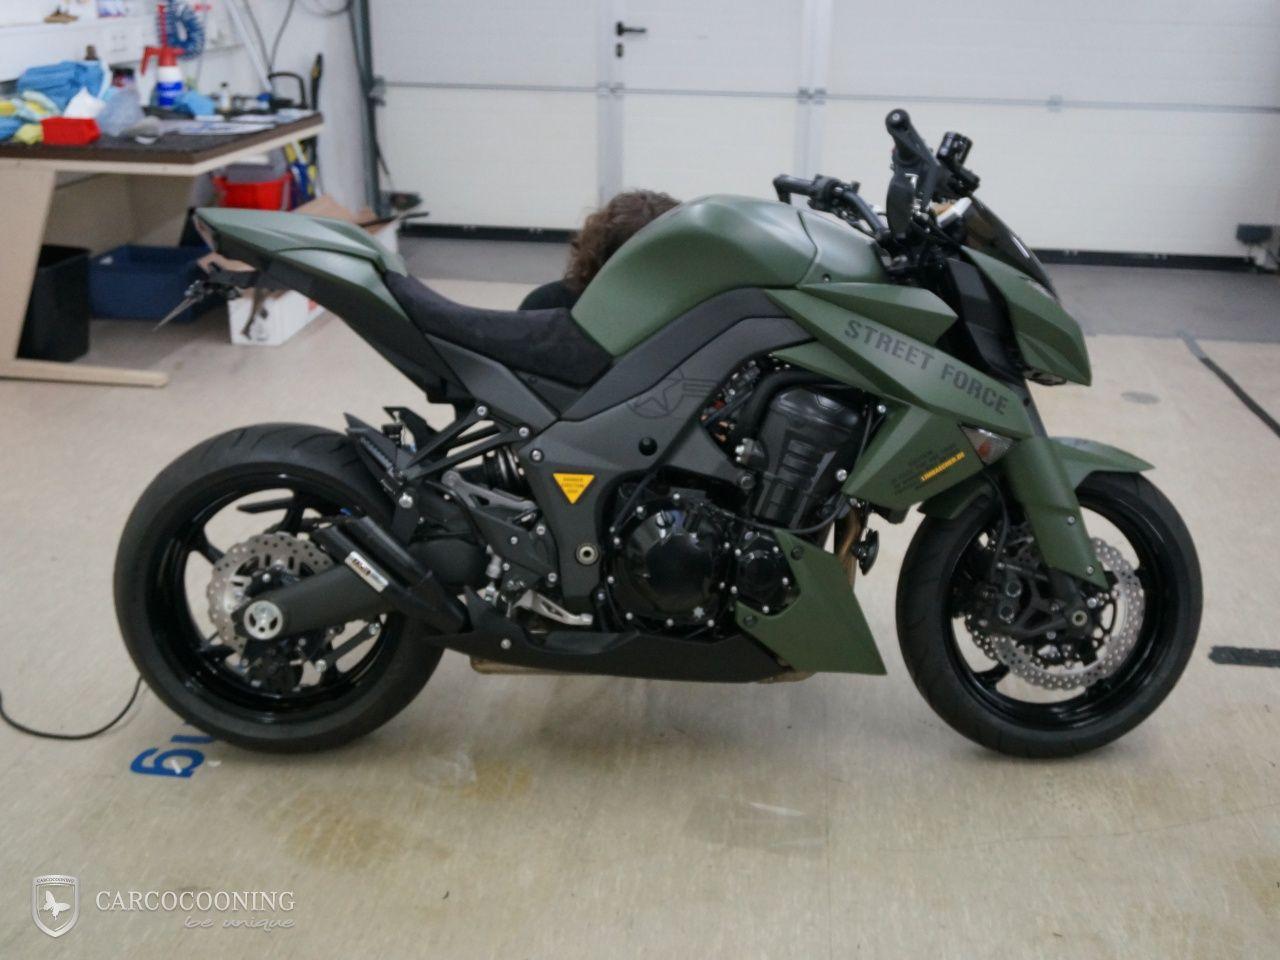 Carcocooning Motorrad Folieren Einer Kawasaki Z1000